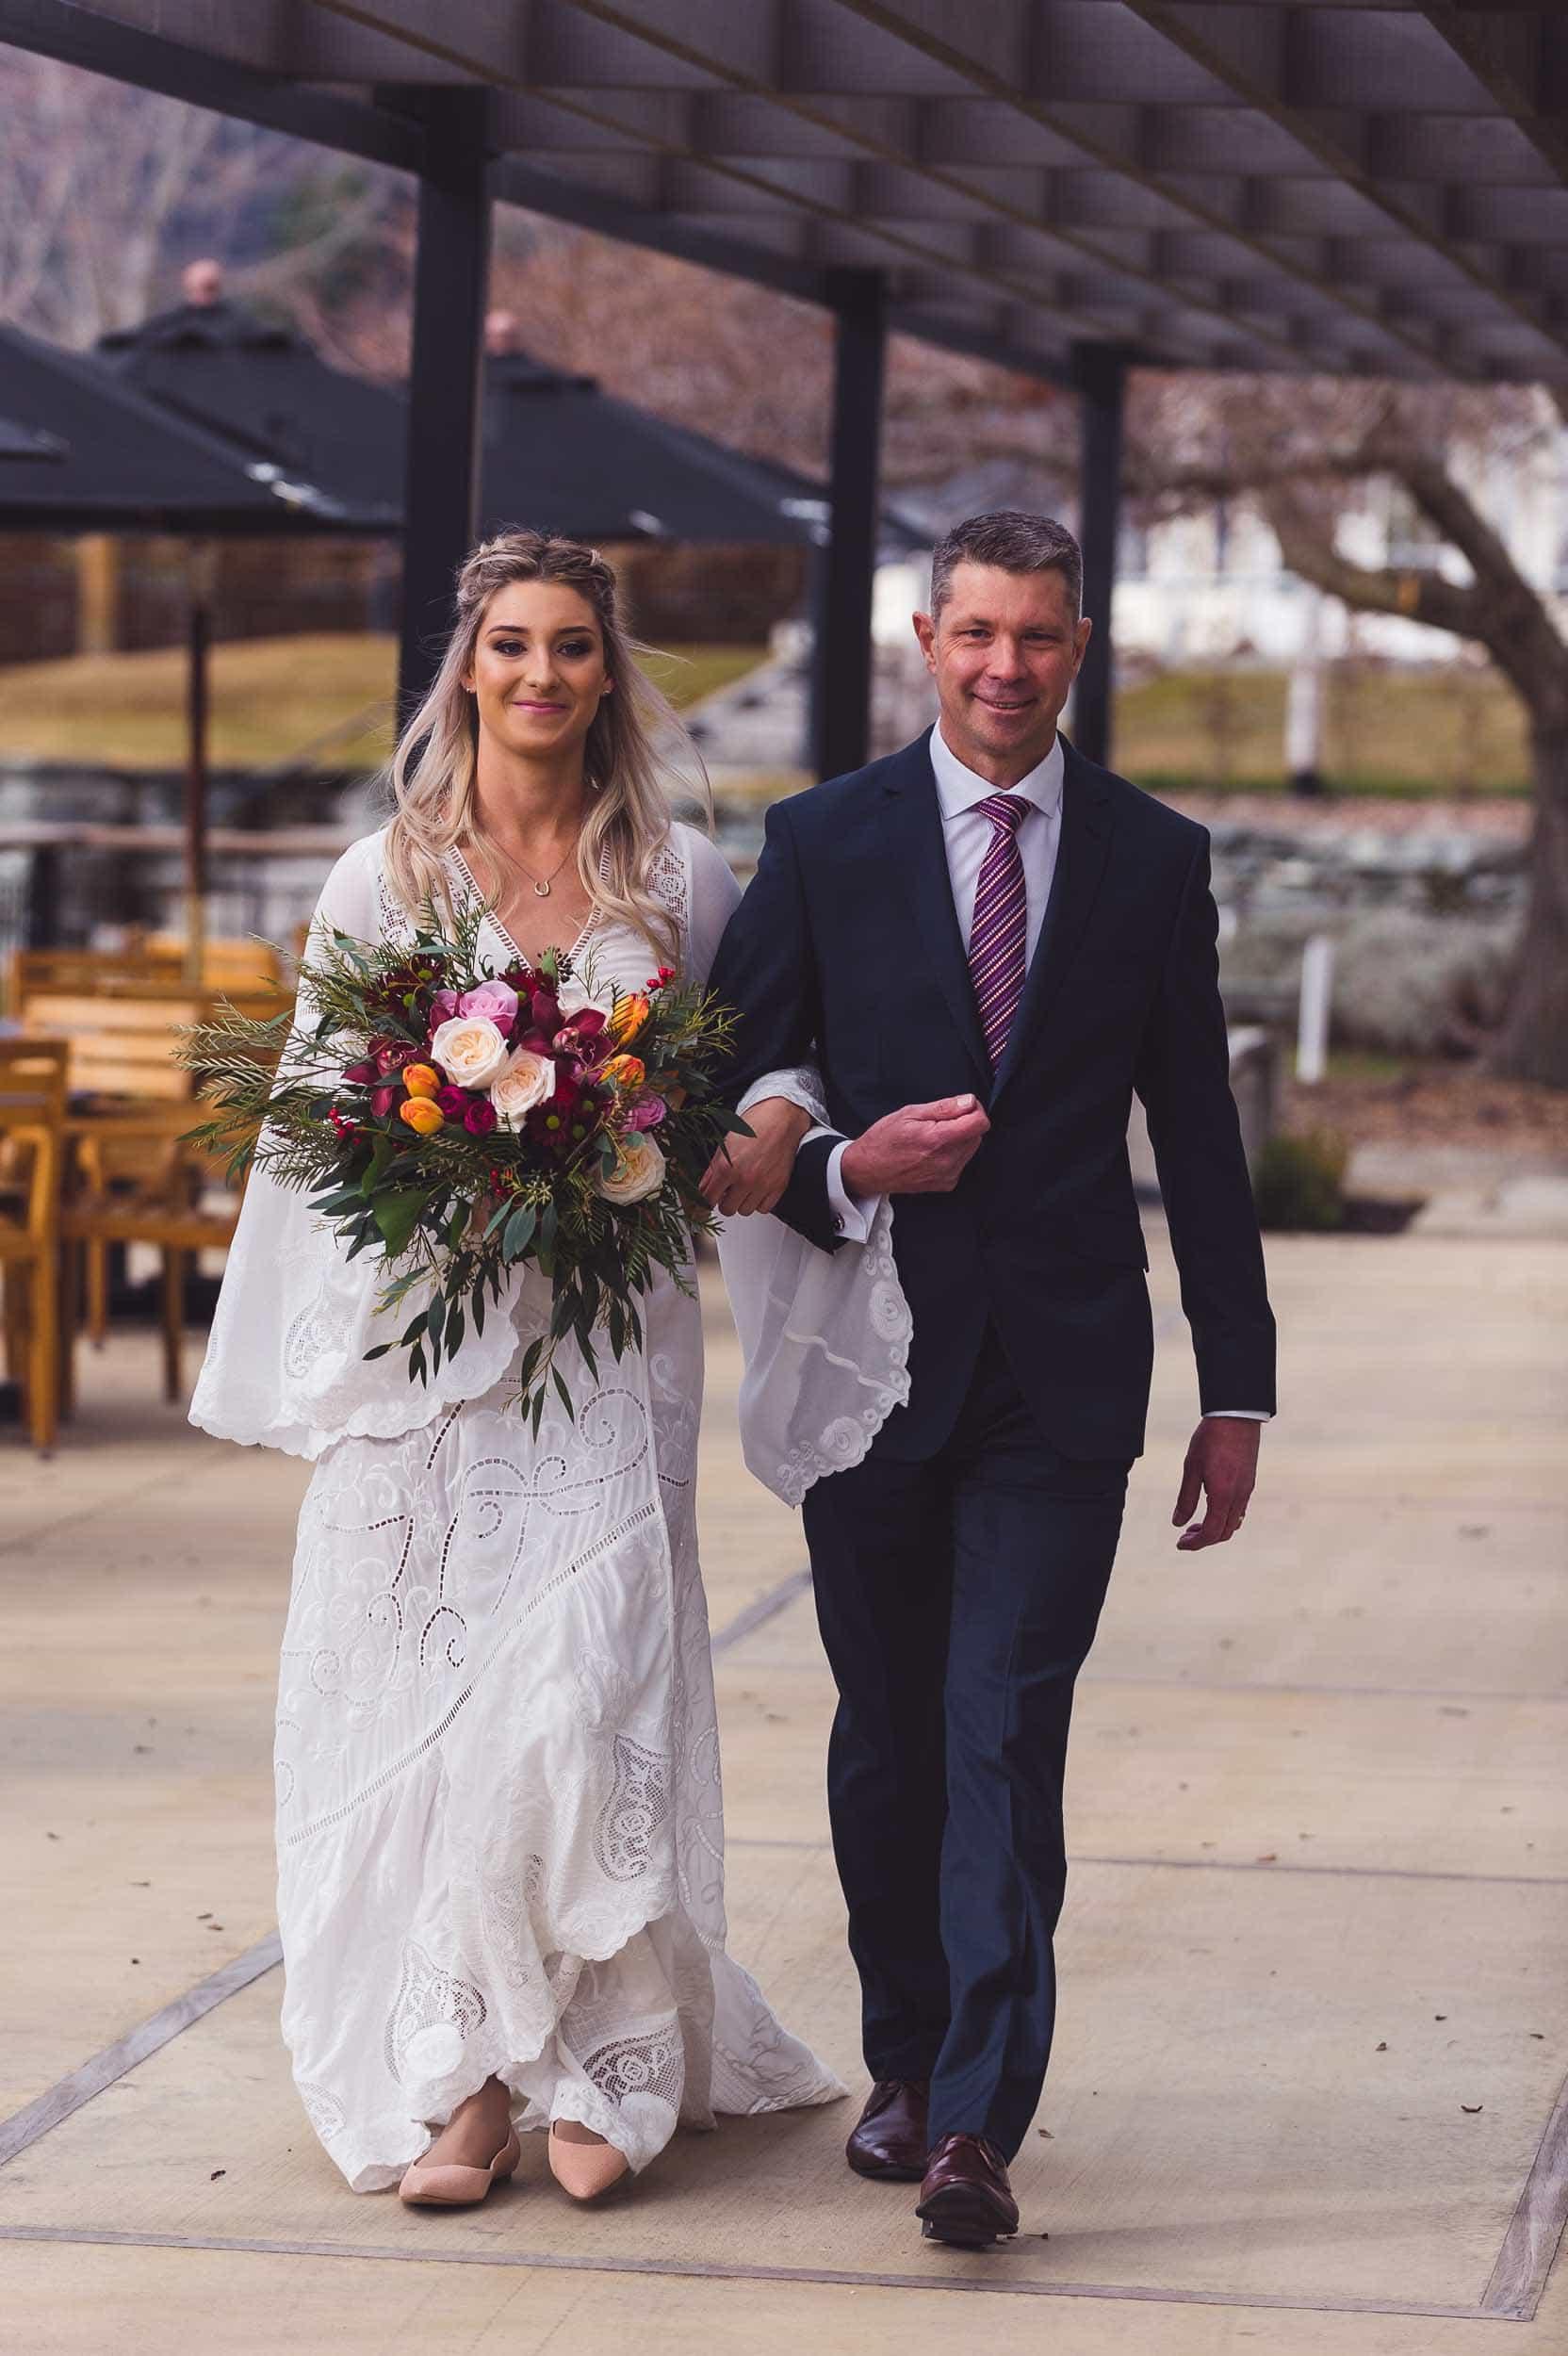 Laura + Nick   Winter Wedding at Milbrook Resort fallon photography